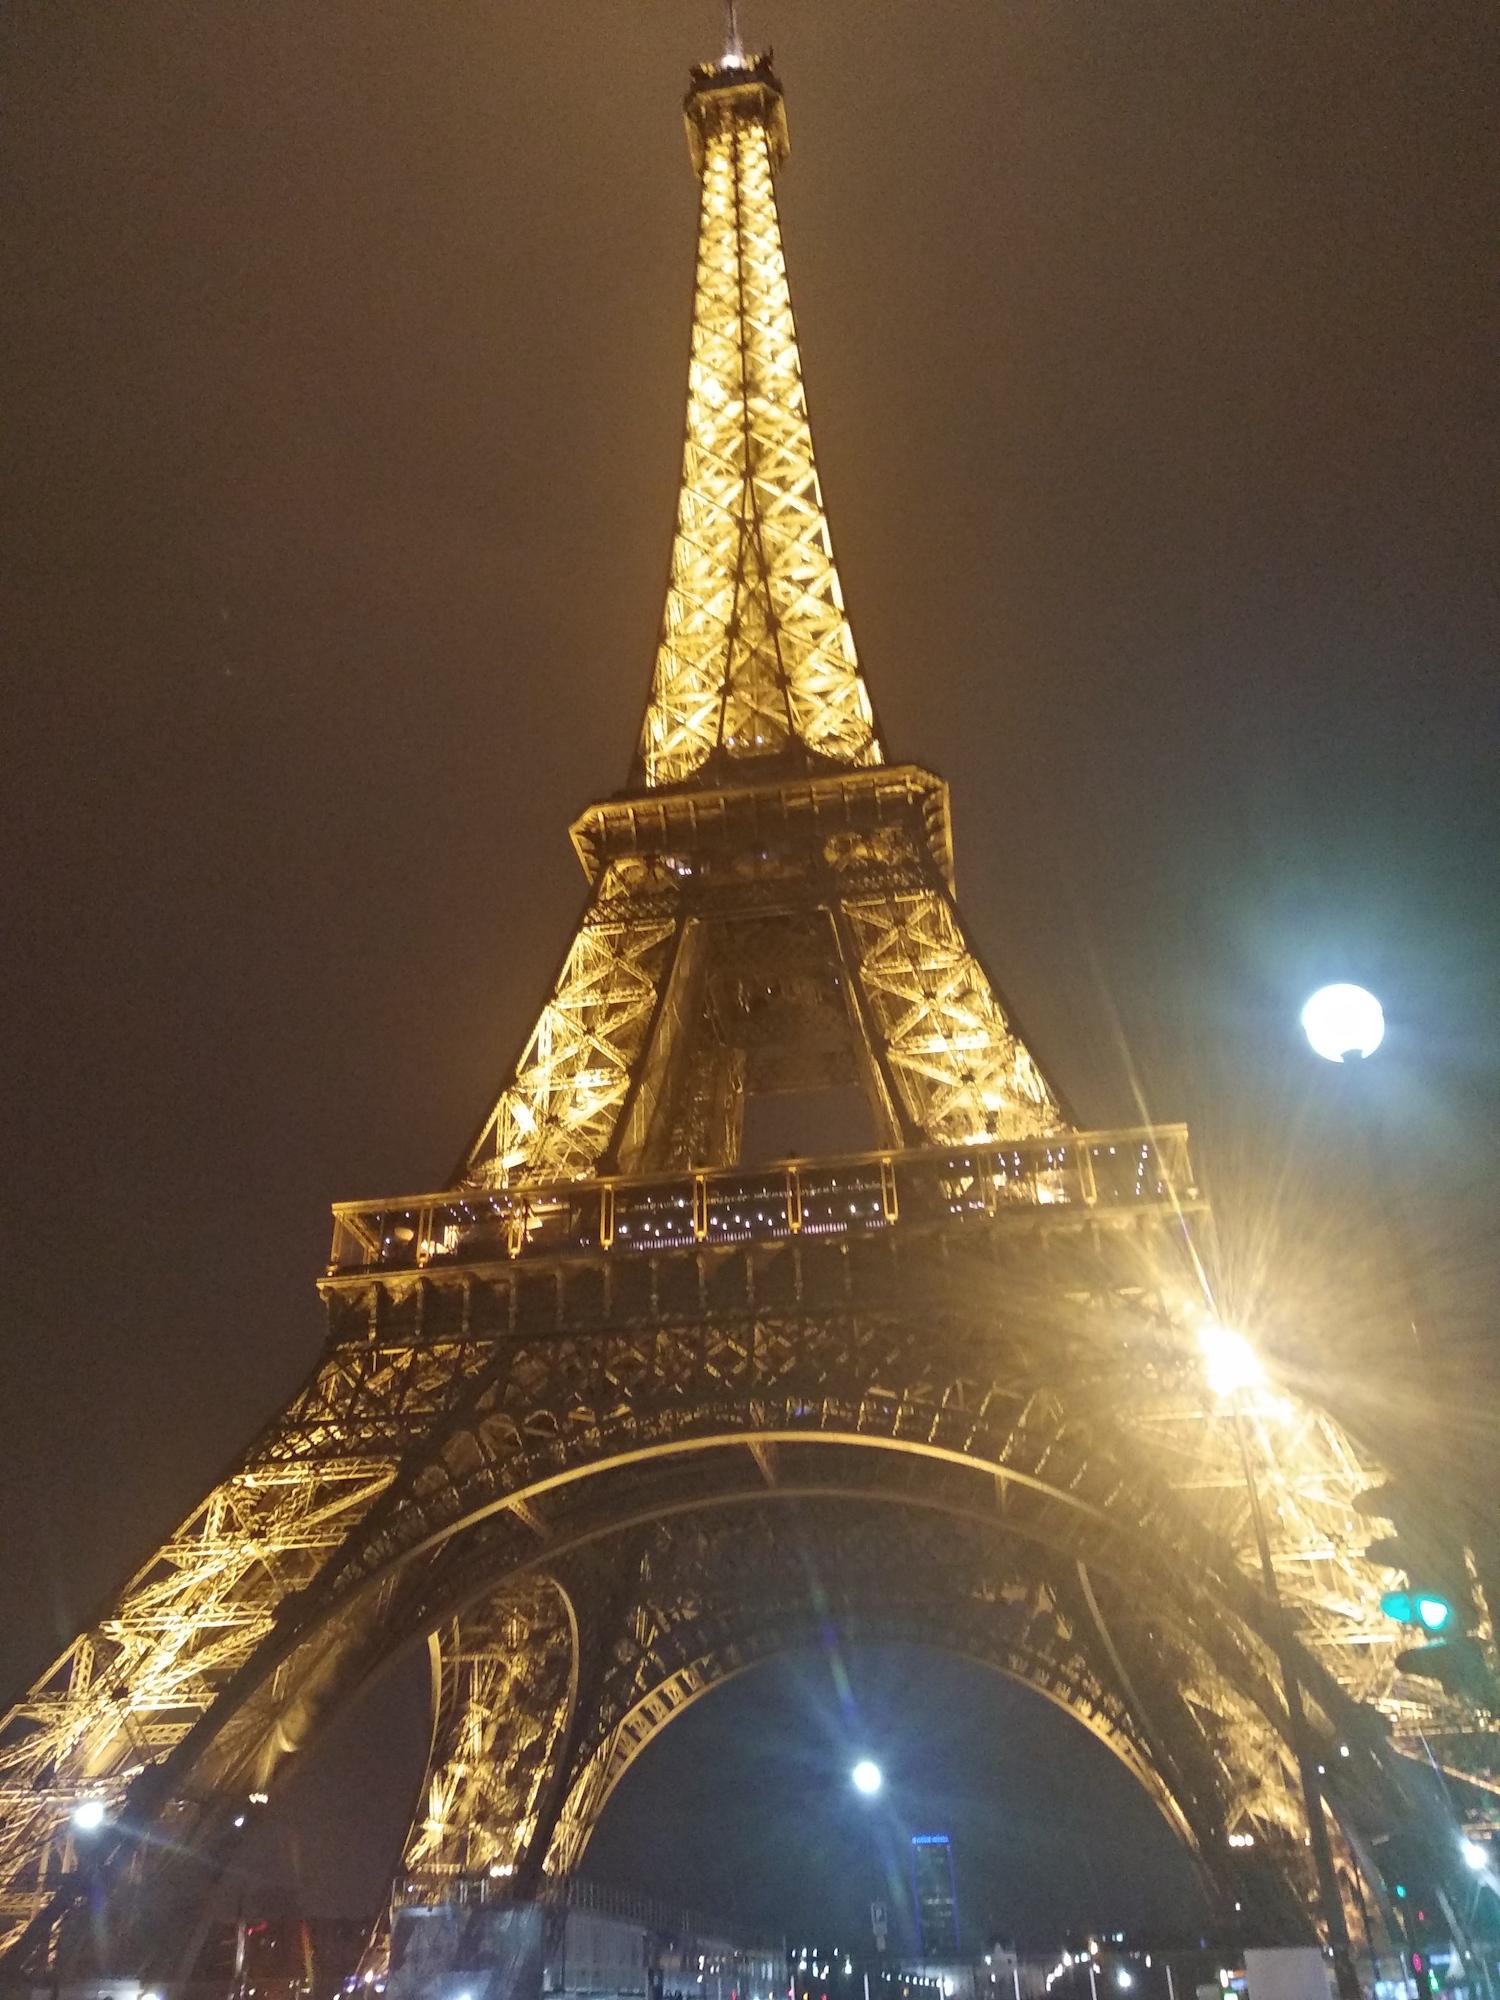 The Paris Experience